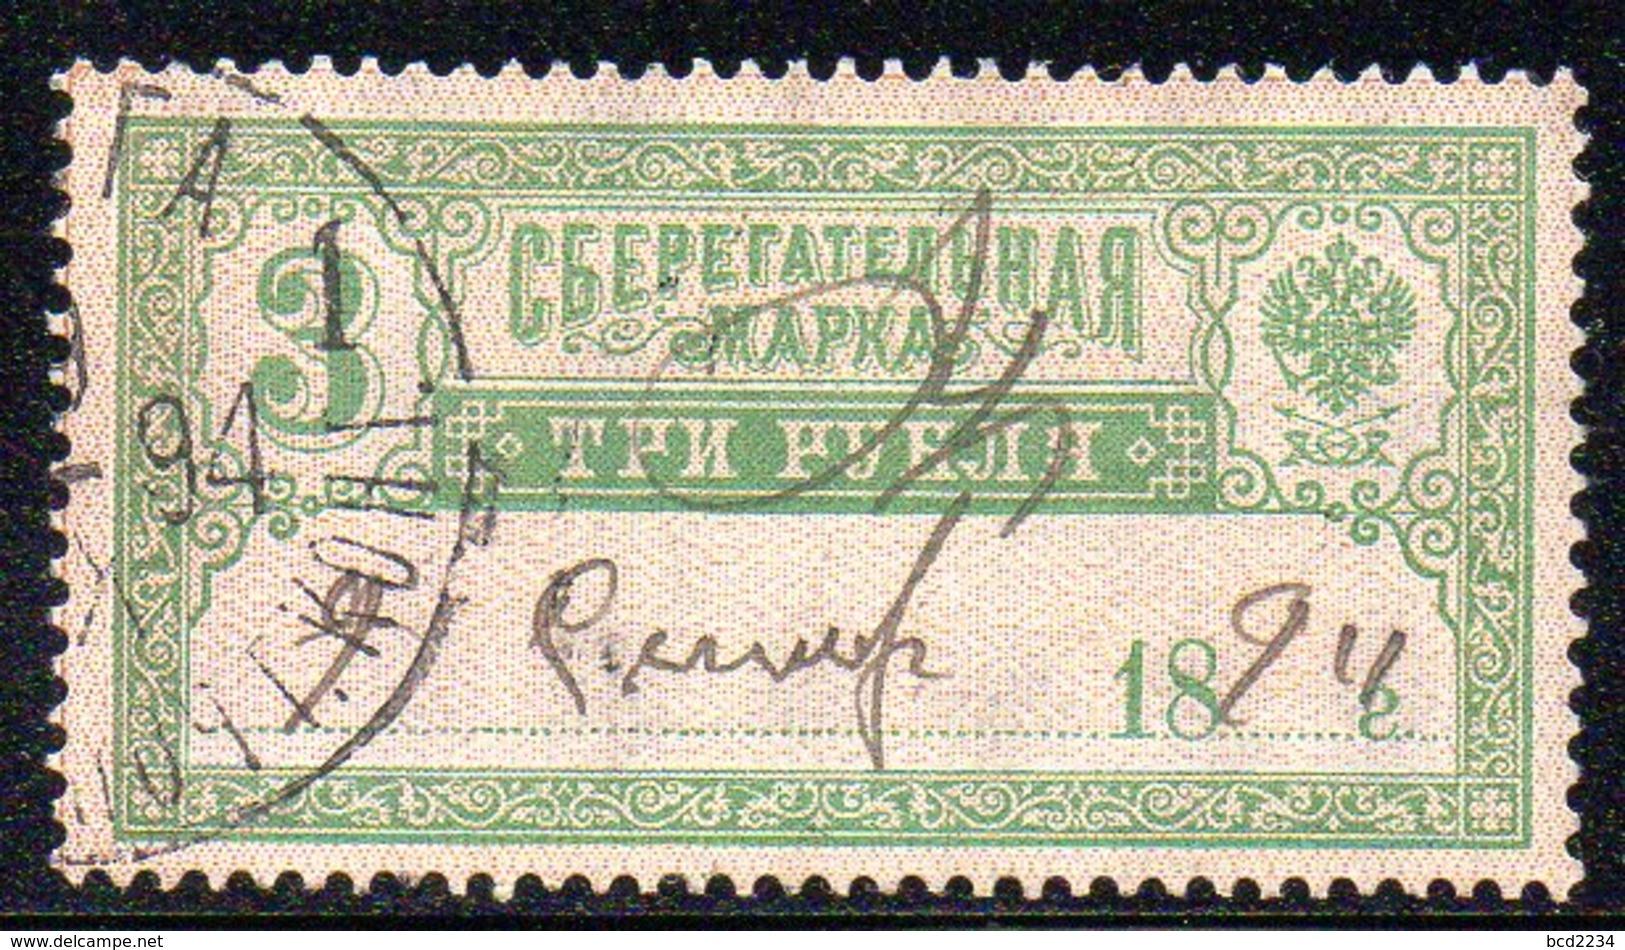 RUSSIA 1890 POSTAL SAVINGS RECEIPT REVENUE 3R YELLOW-GREEN STEUERMARKE FISCAUX USED 1894 USSR - Zonder Classificatie